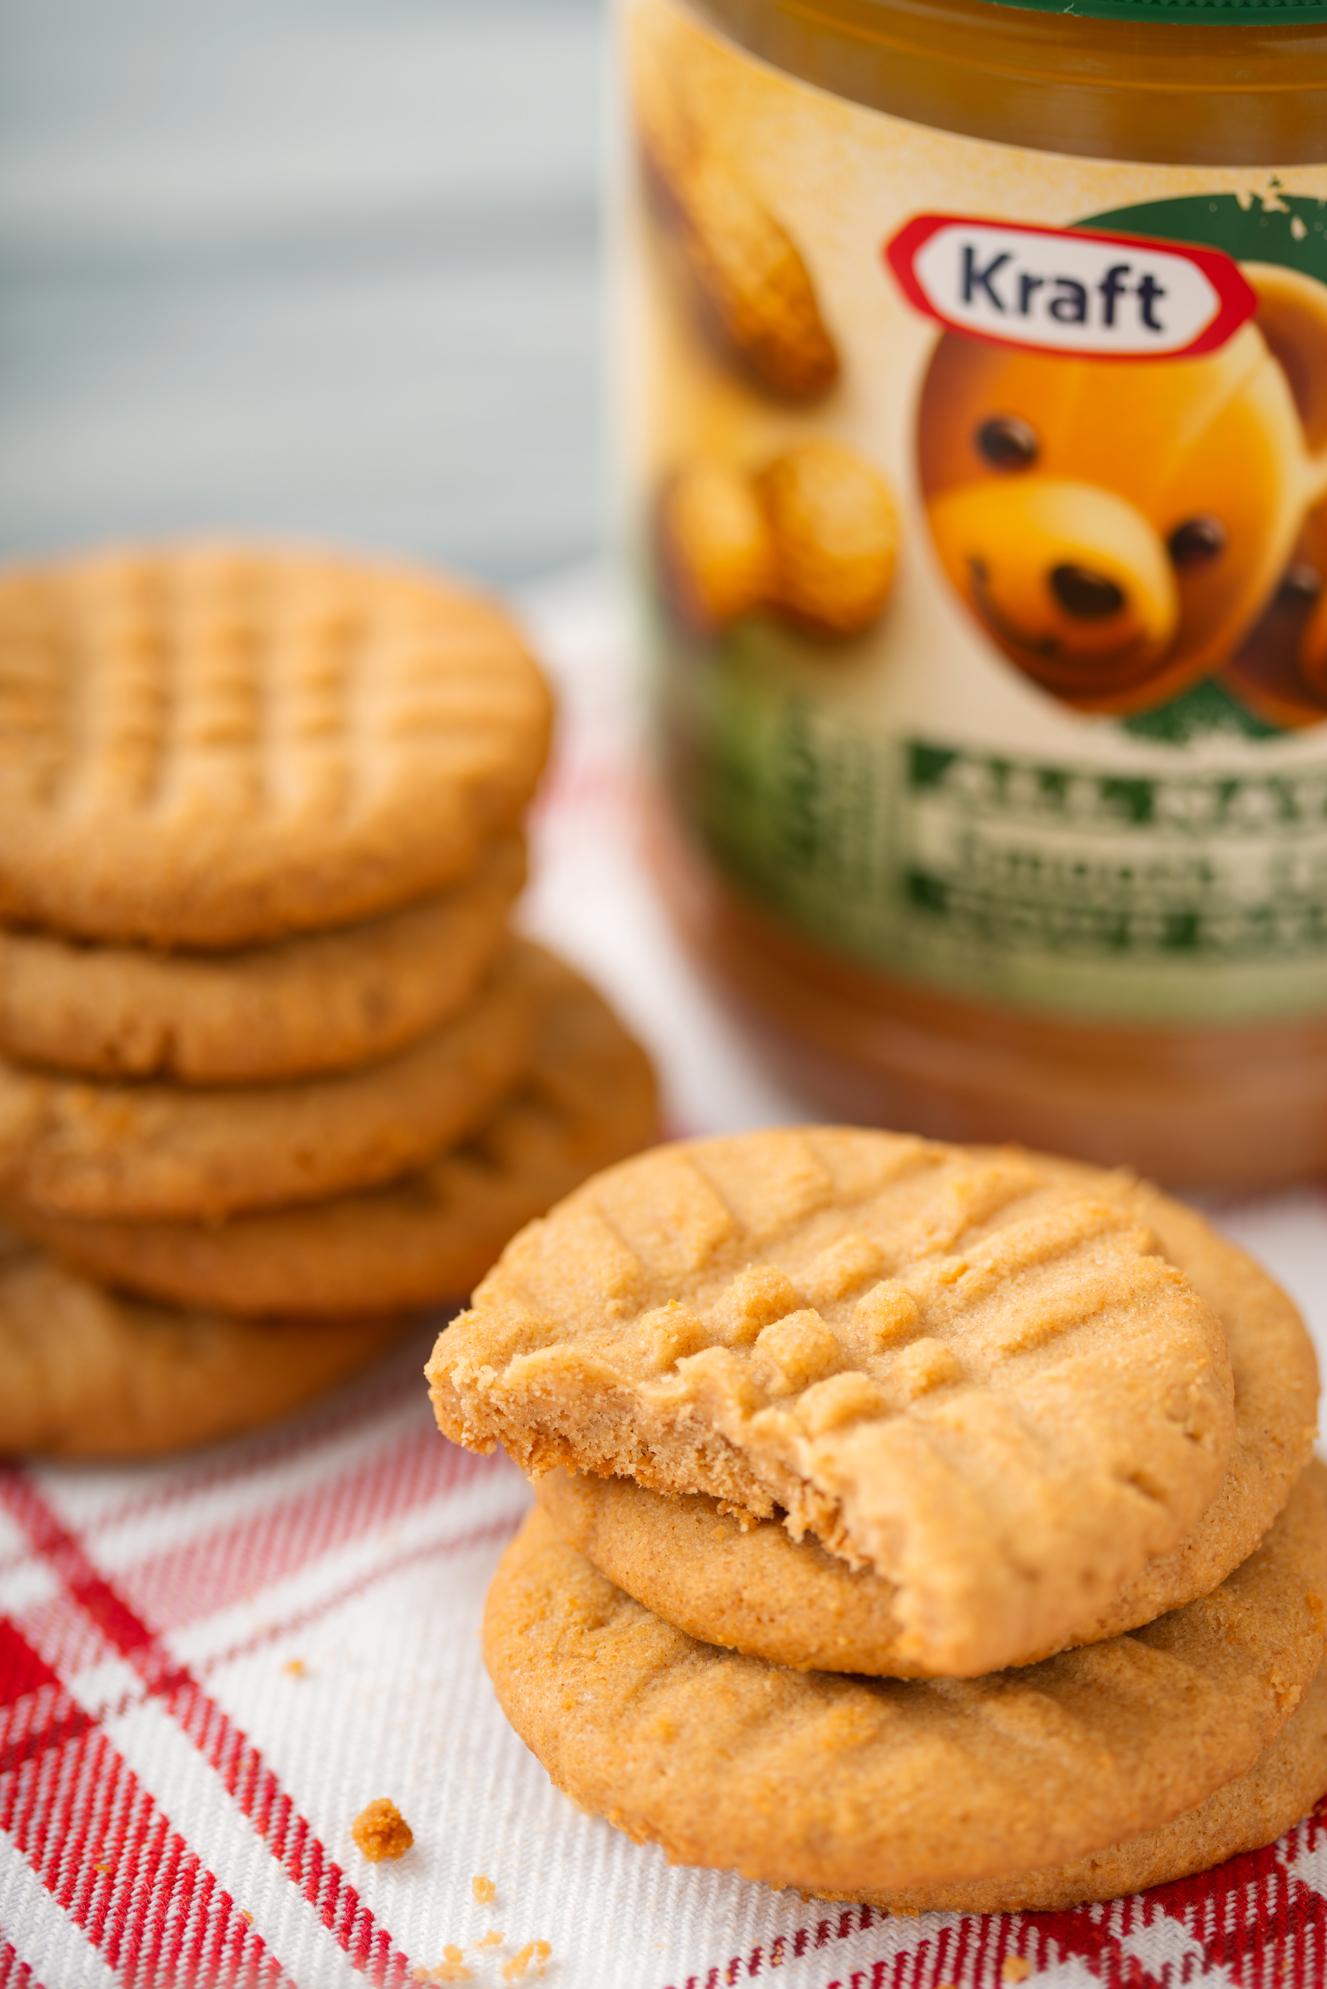 Nameless-Productions©-Kraft-PB-Cookies